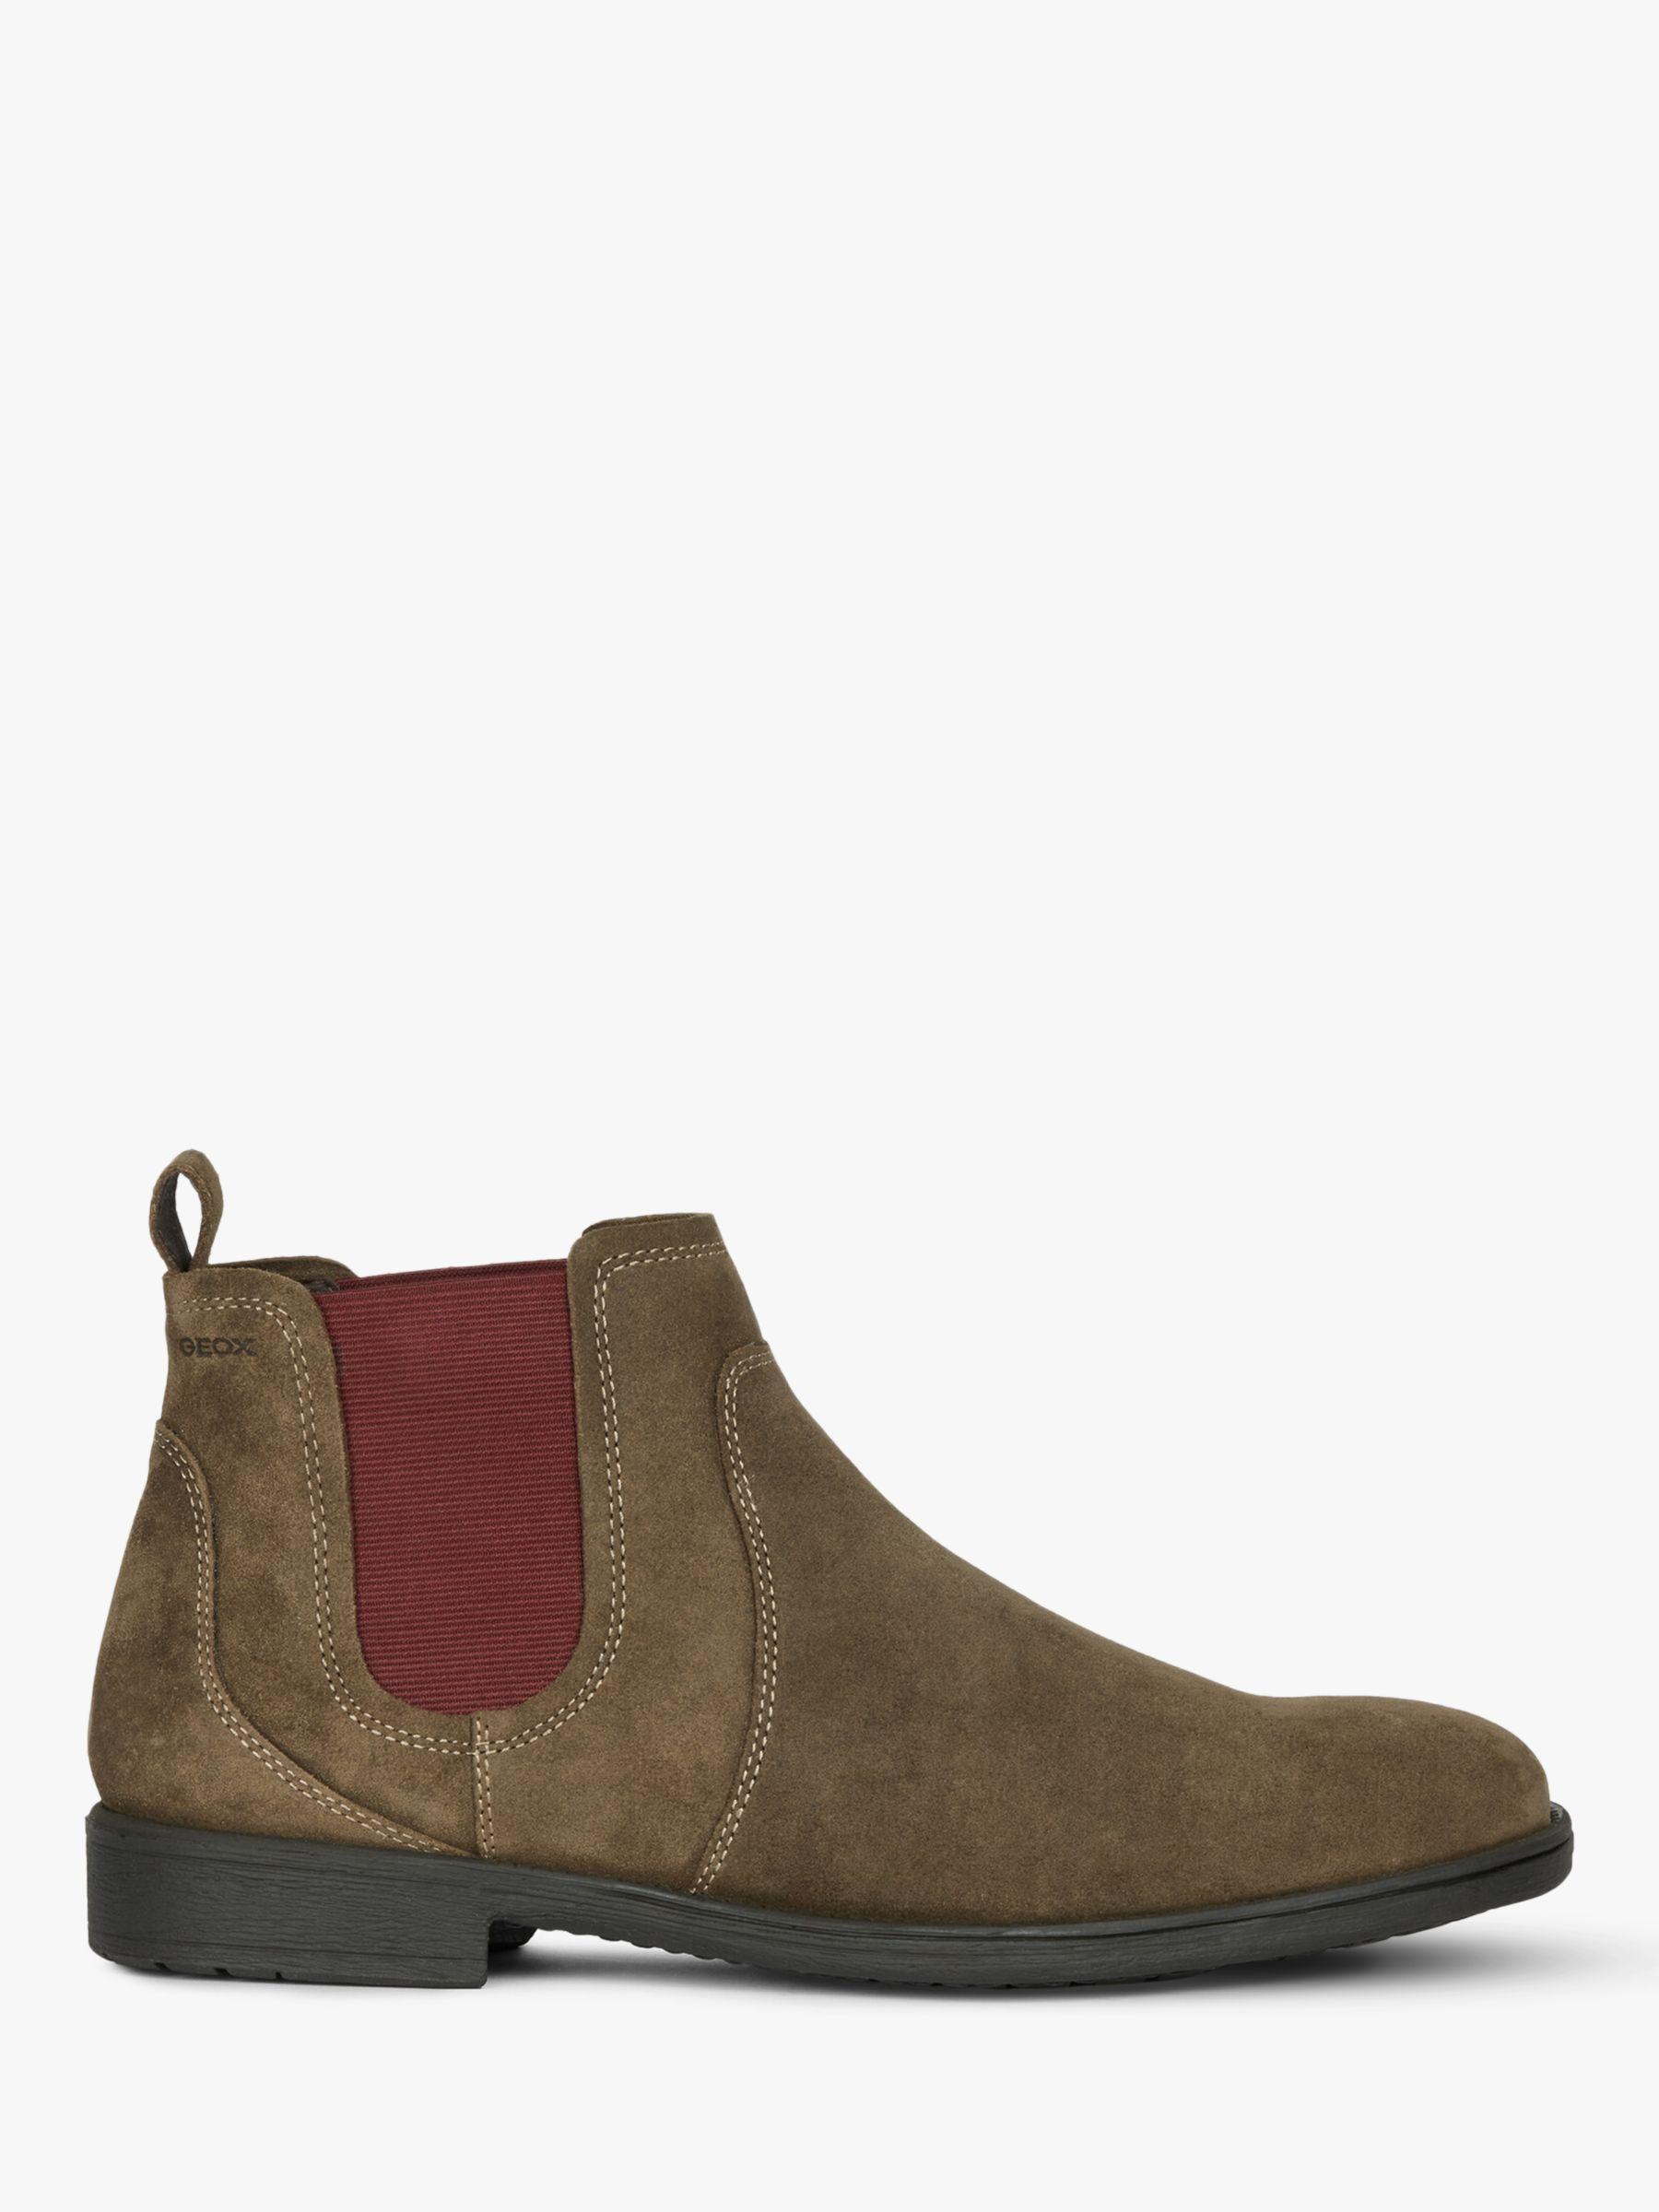 Geox Geox Jaylon Suede Chelsea Boots, Multi Brown